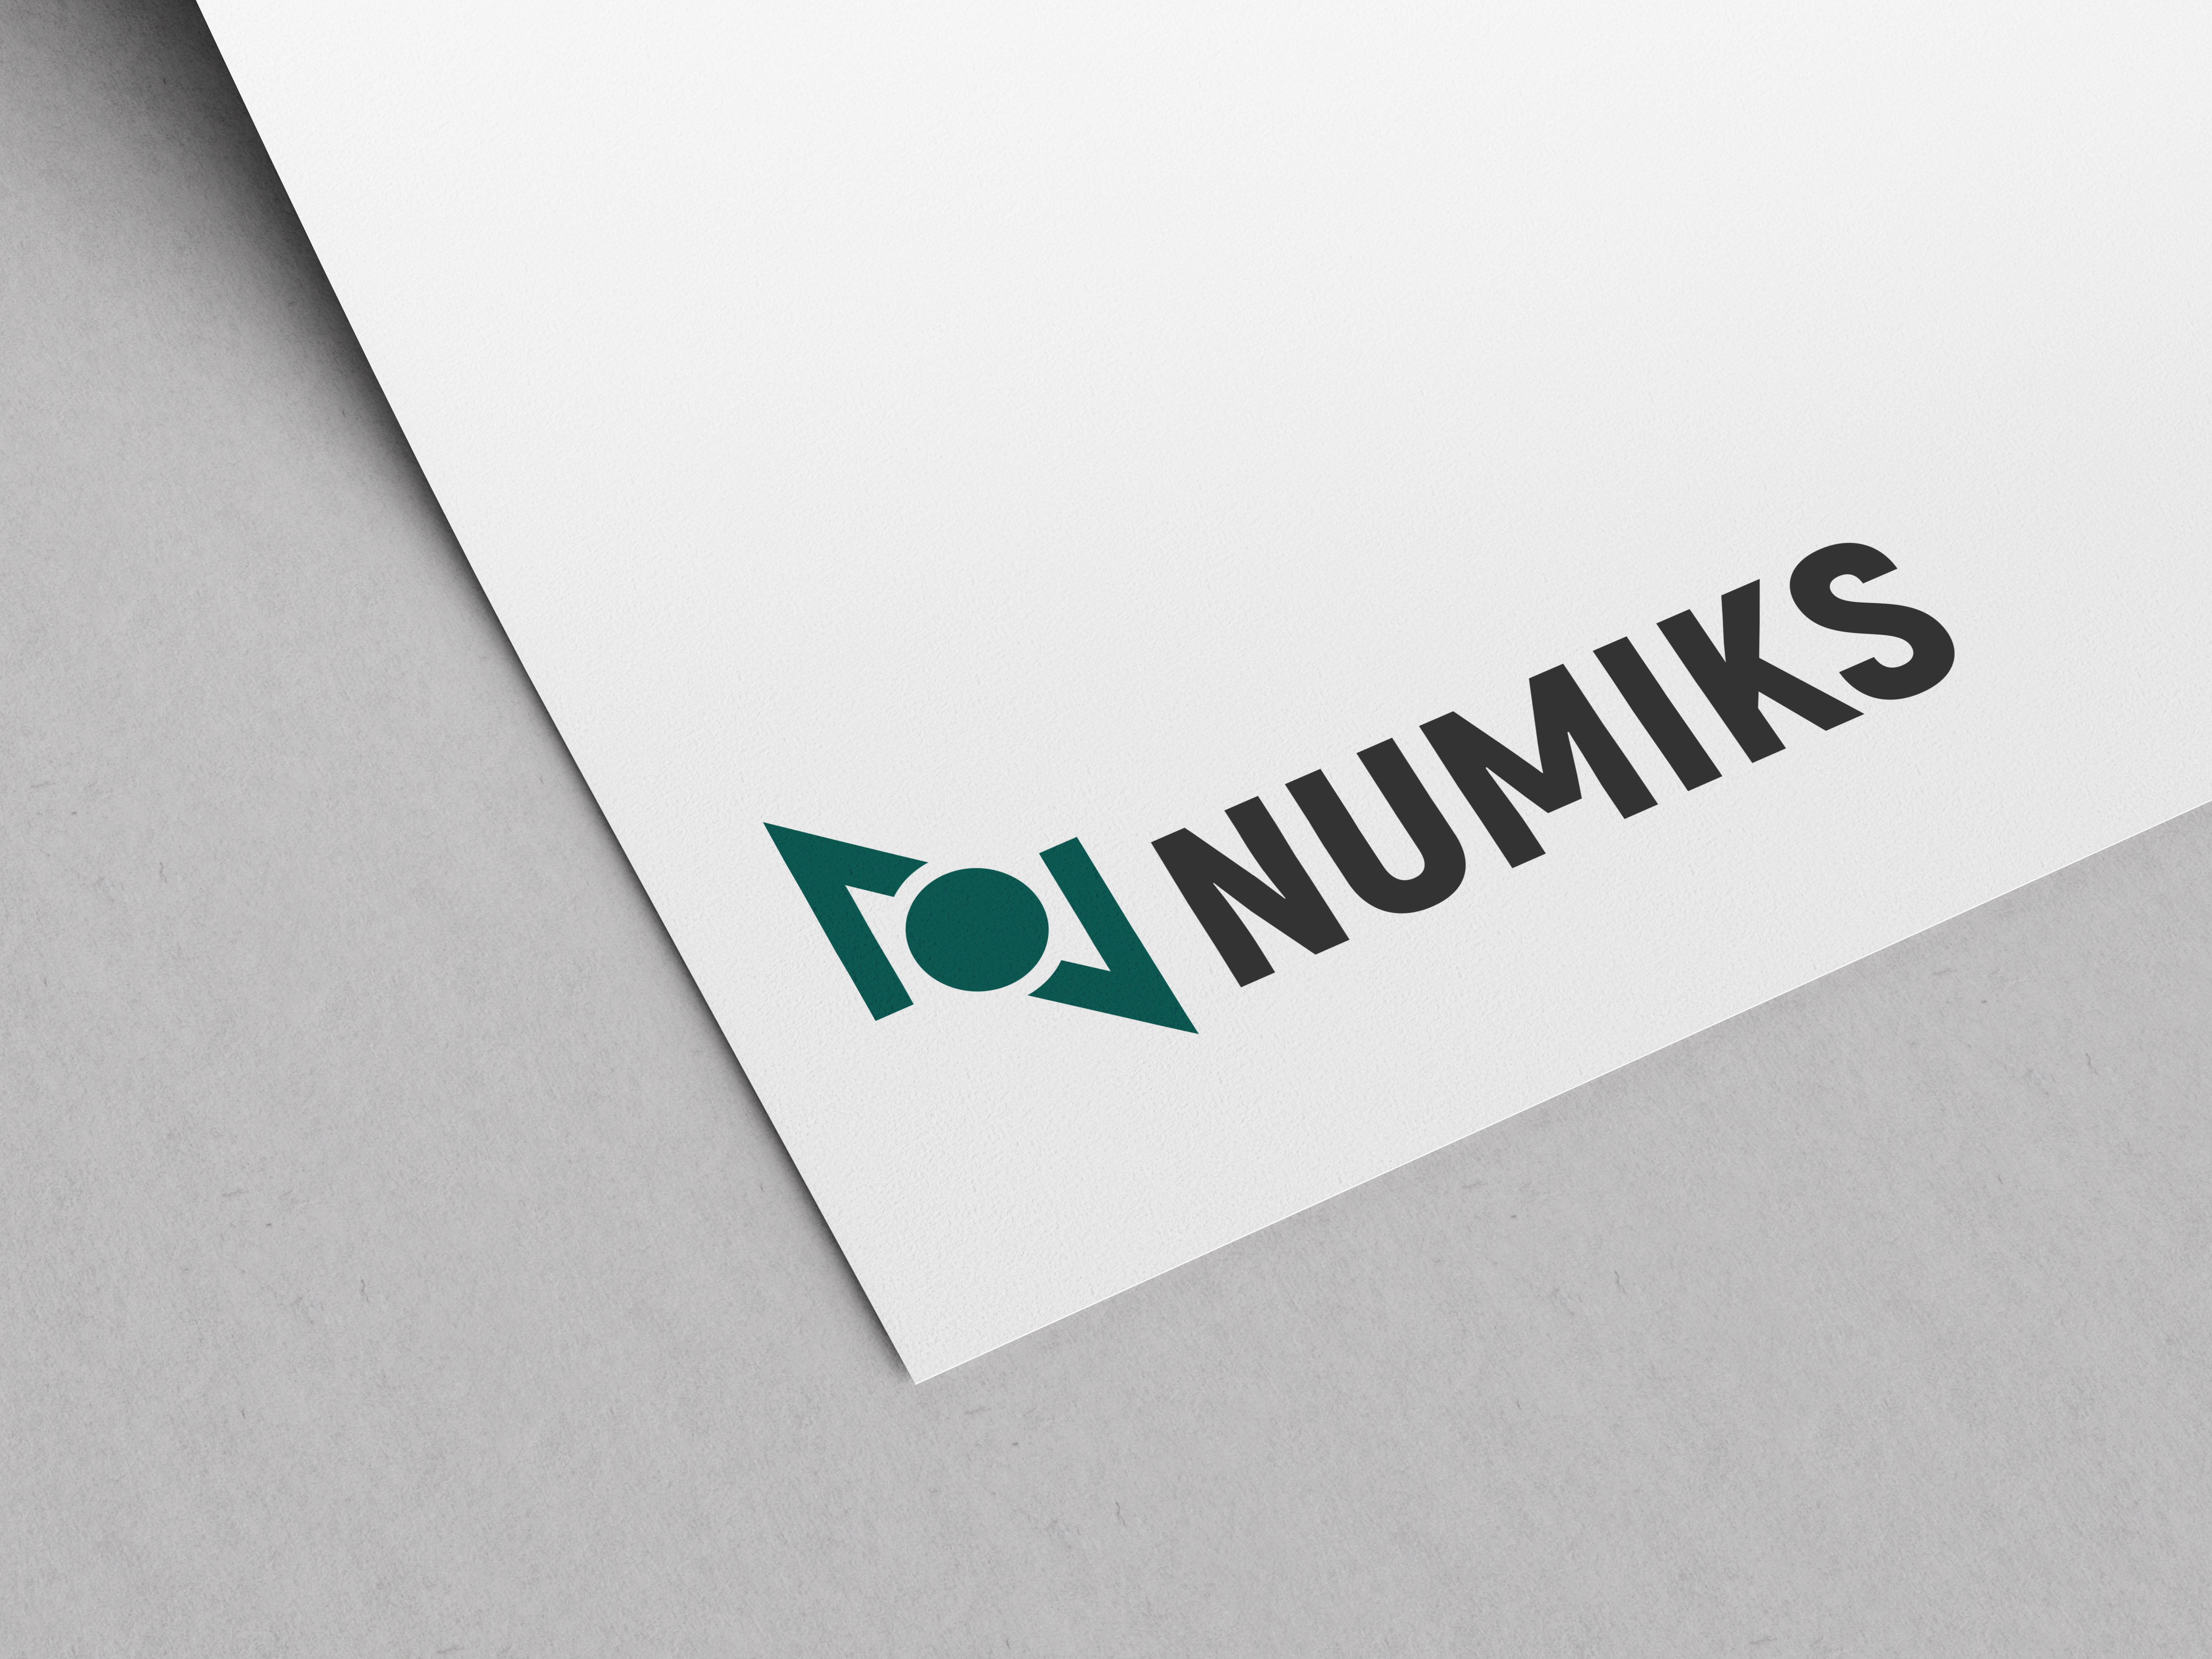 Логотип для интернет-магазина фото f_4005ec6e73fe3836.jpg